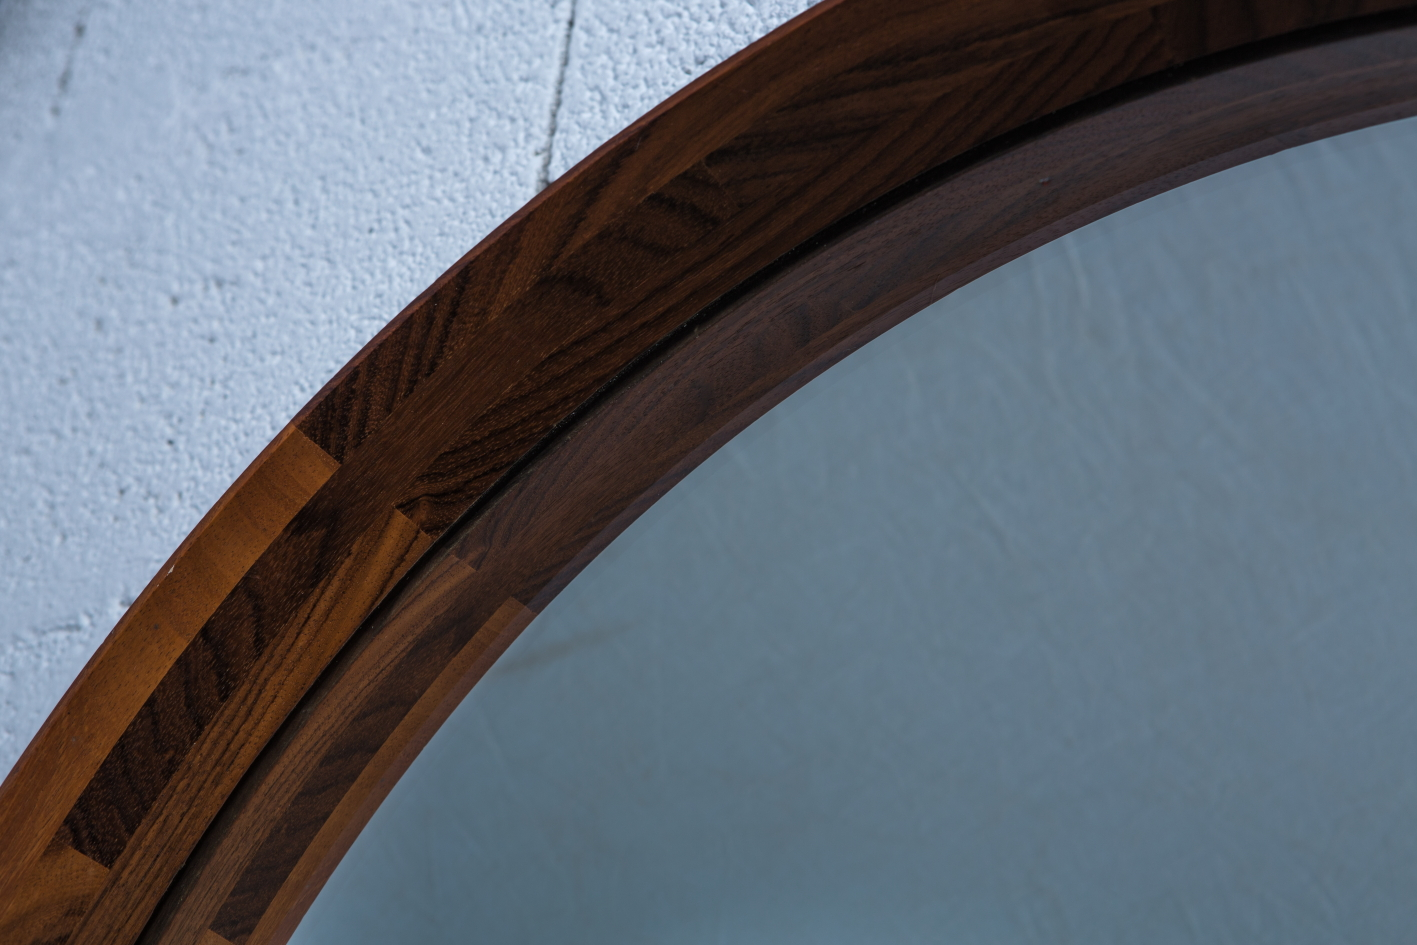 Unique Mid Century Italian Wood Round Mirror produced by Poggi Pavia 1950s Italy - Wood Construction detail